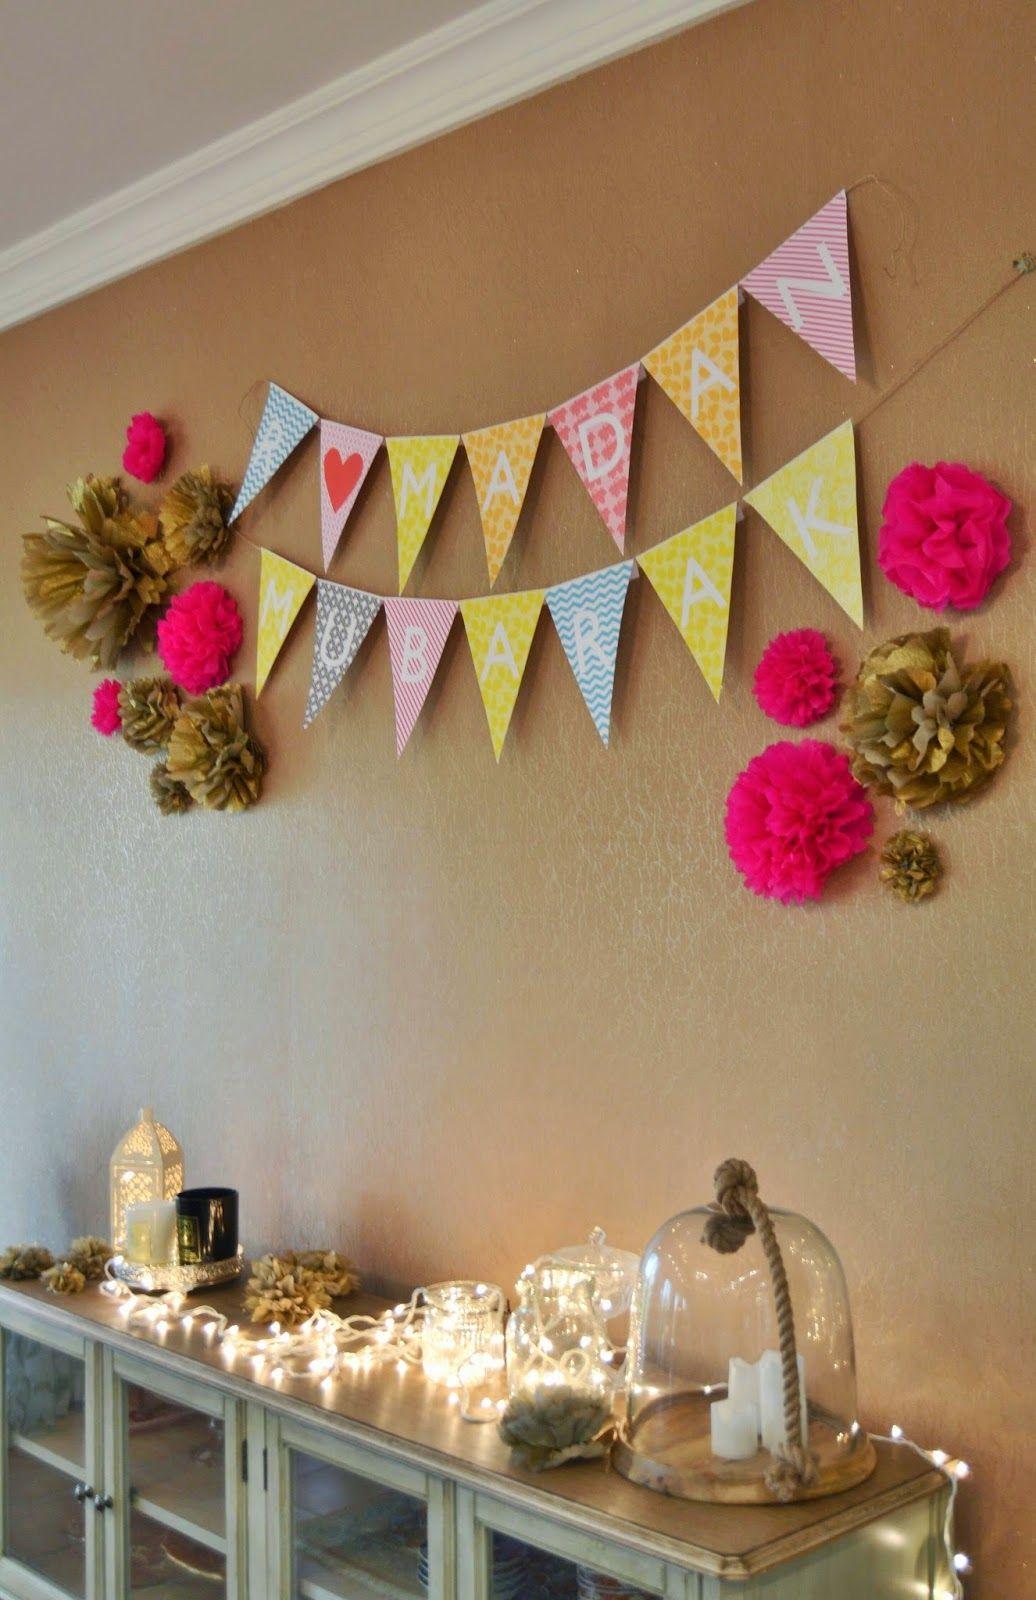 Melanie Eman Ramadan Eid Decor Ramadan Eid Pinterest Eid Ramadan And Decoration